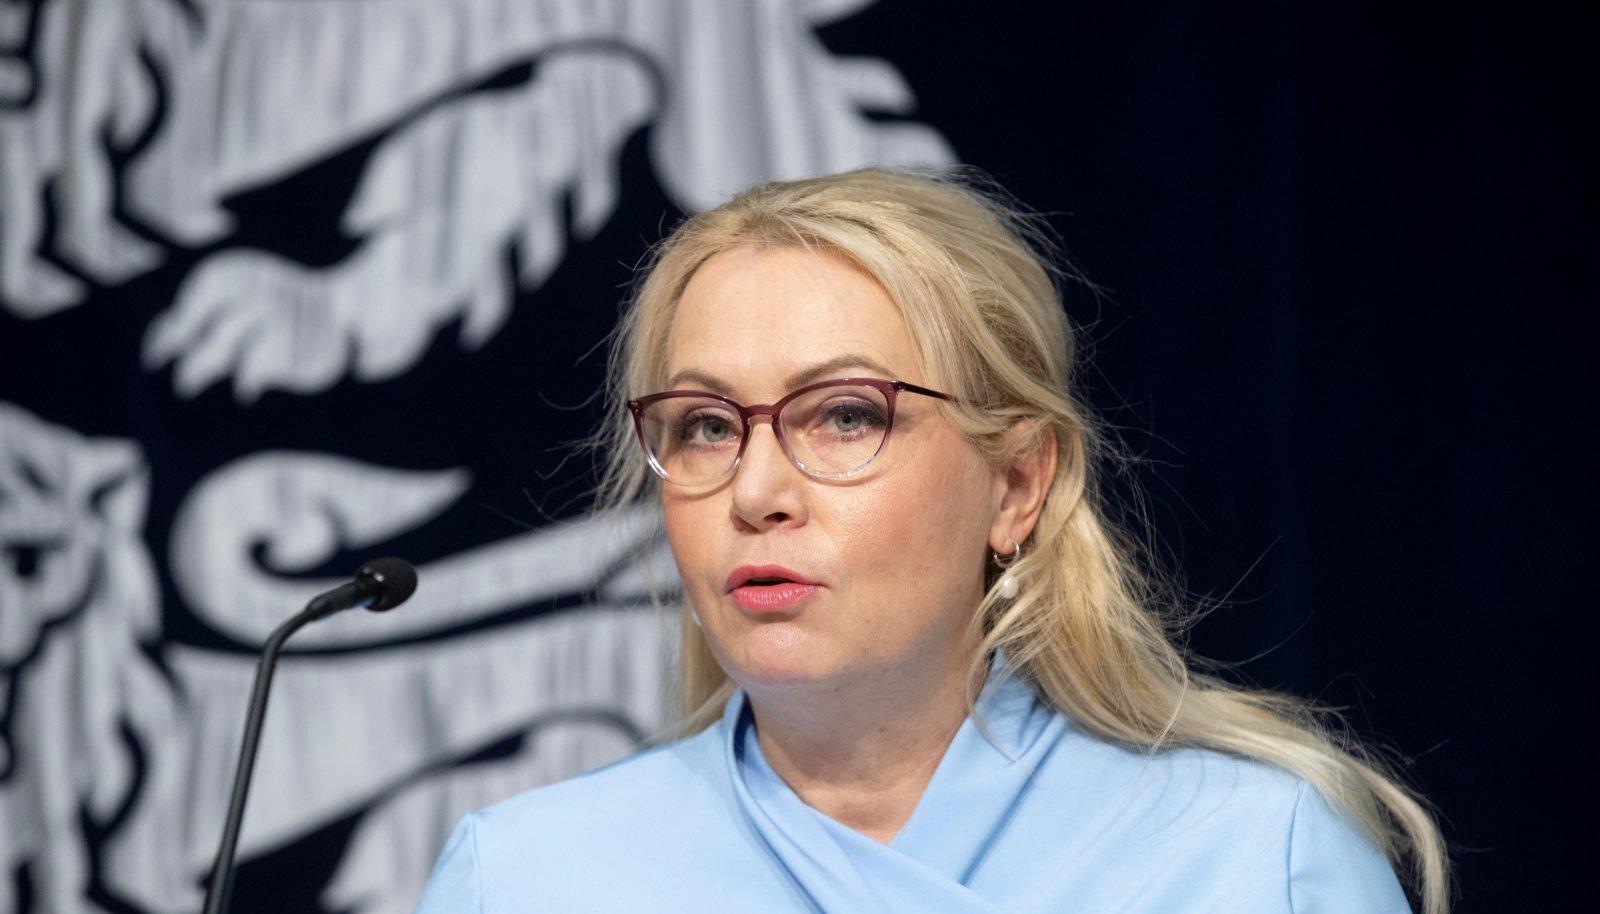 Valitsuse pressikonverents 10.12.20, Riina Solman